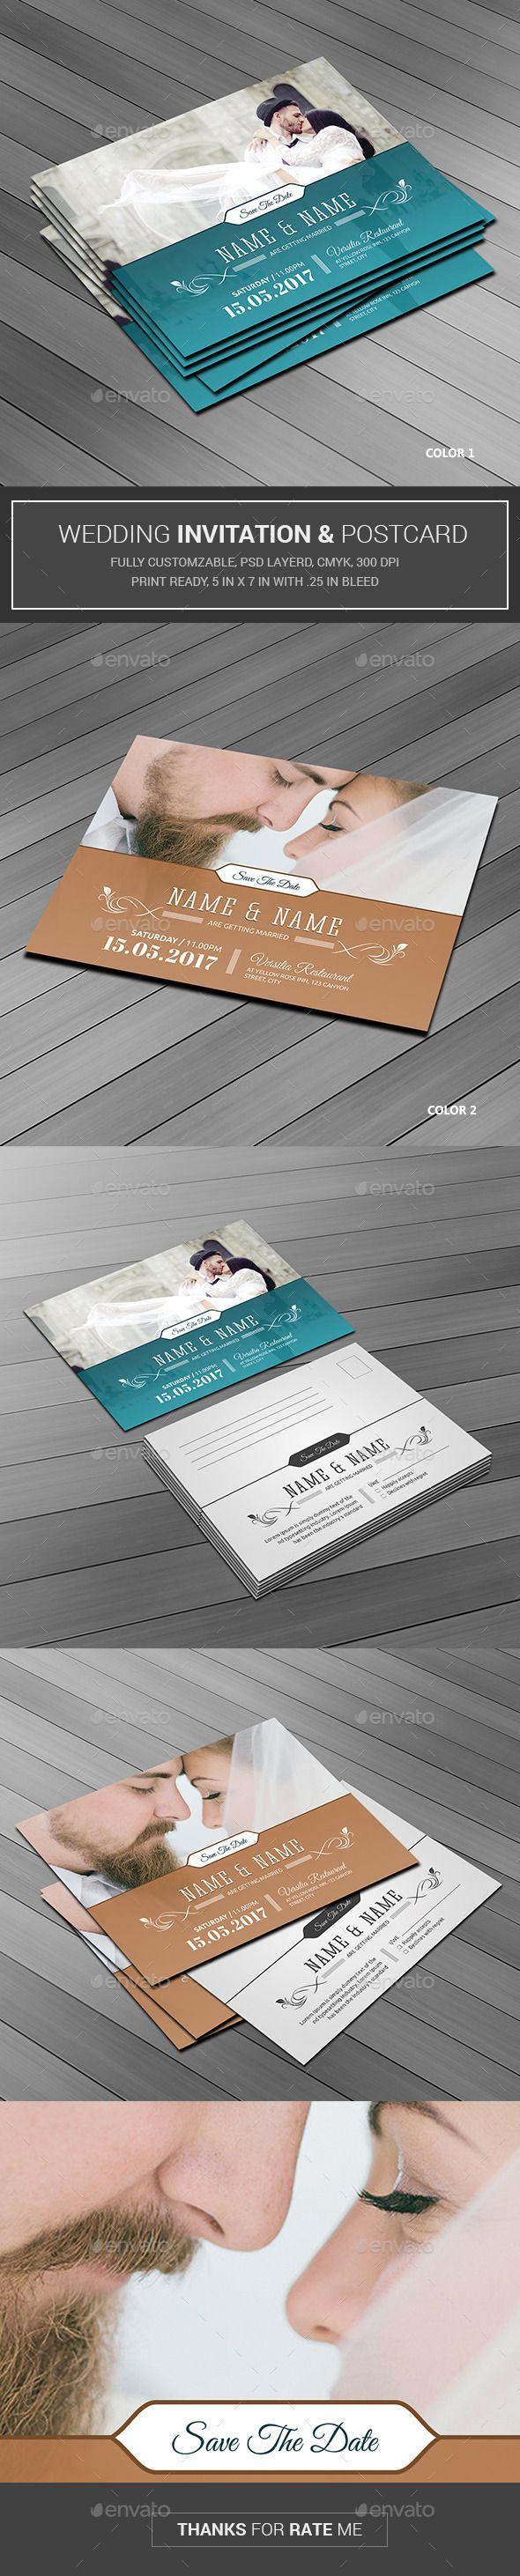 Wedding Invitation - Weddings Cards & Invites Instant Download http://graphicriver.net/item/wedding-invitation/12110678?ref=themedevisers